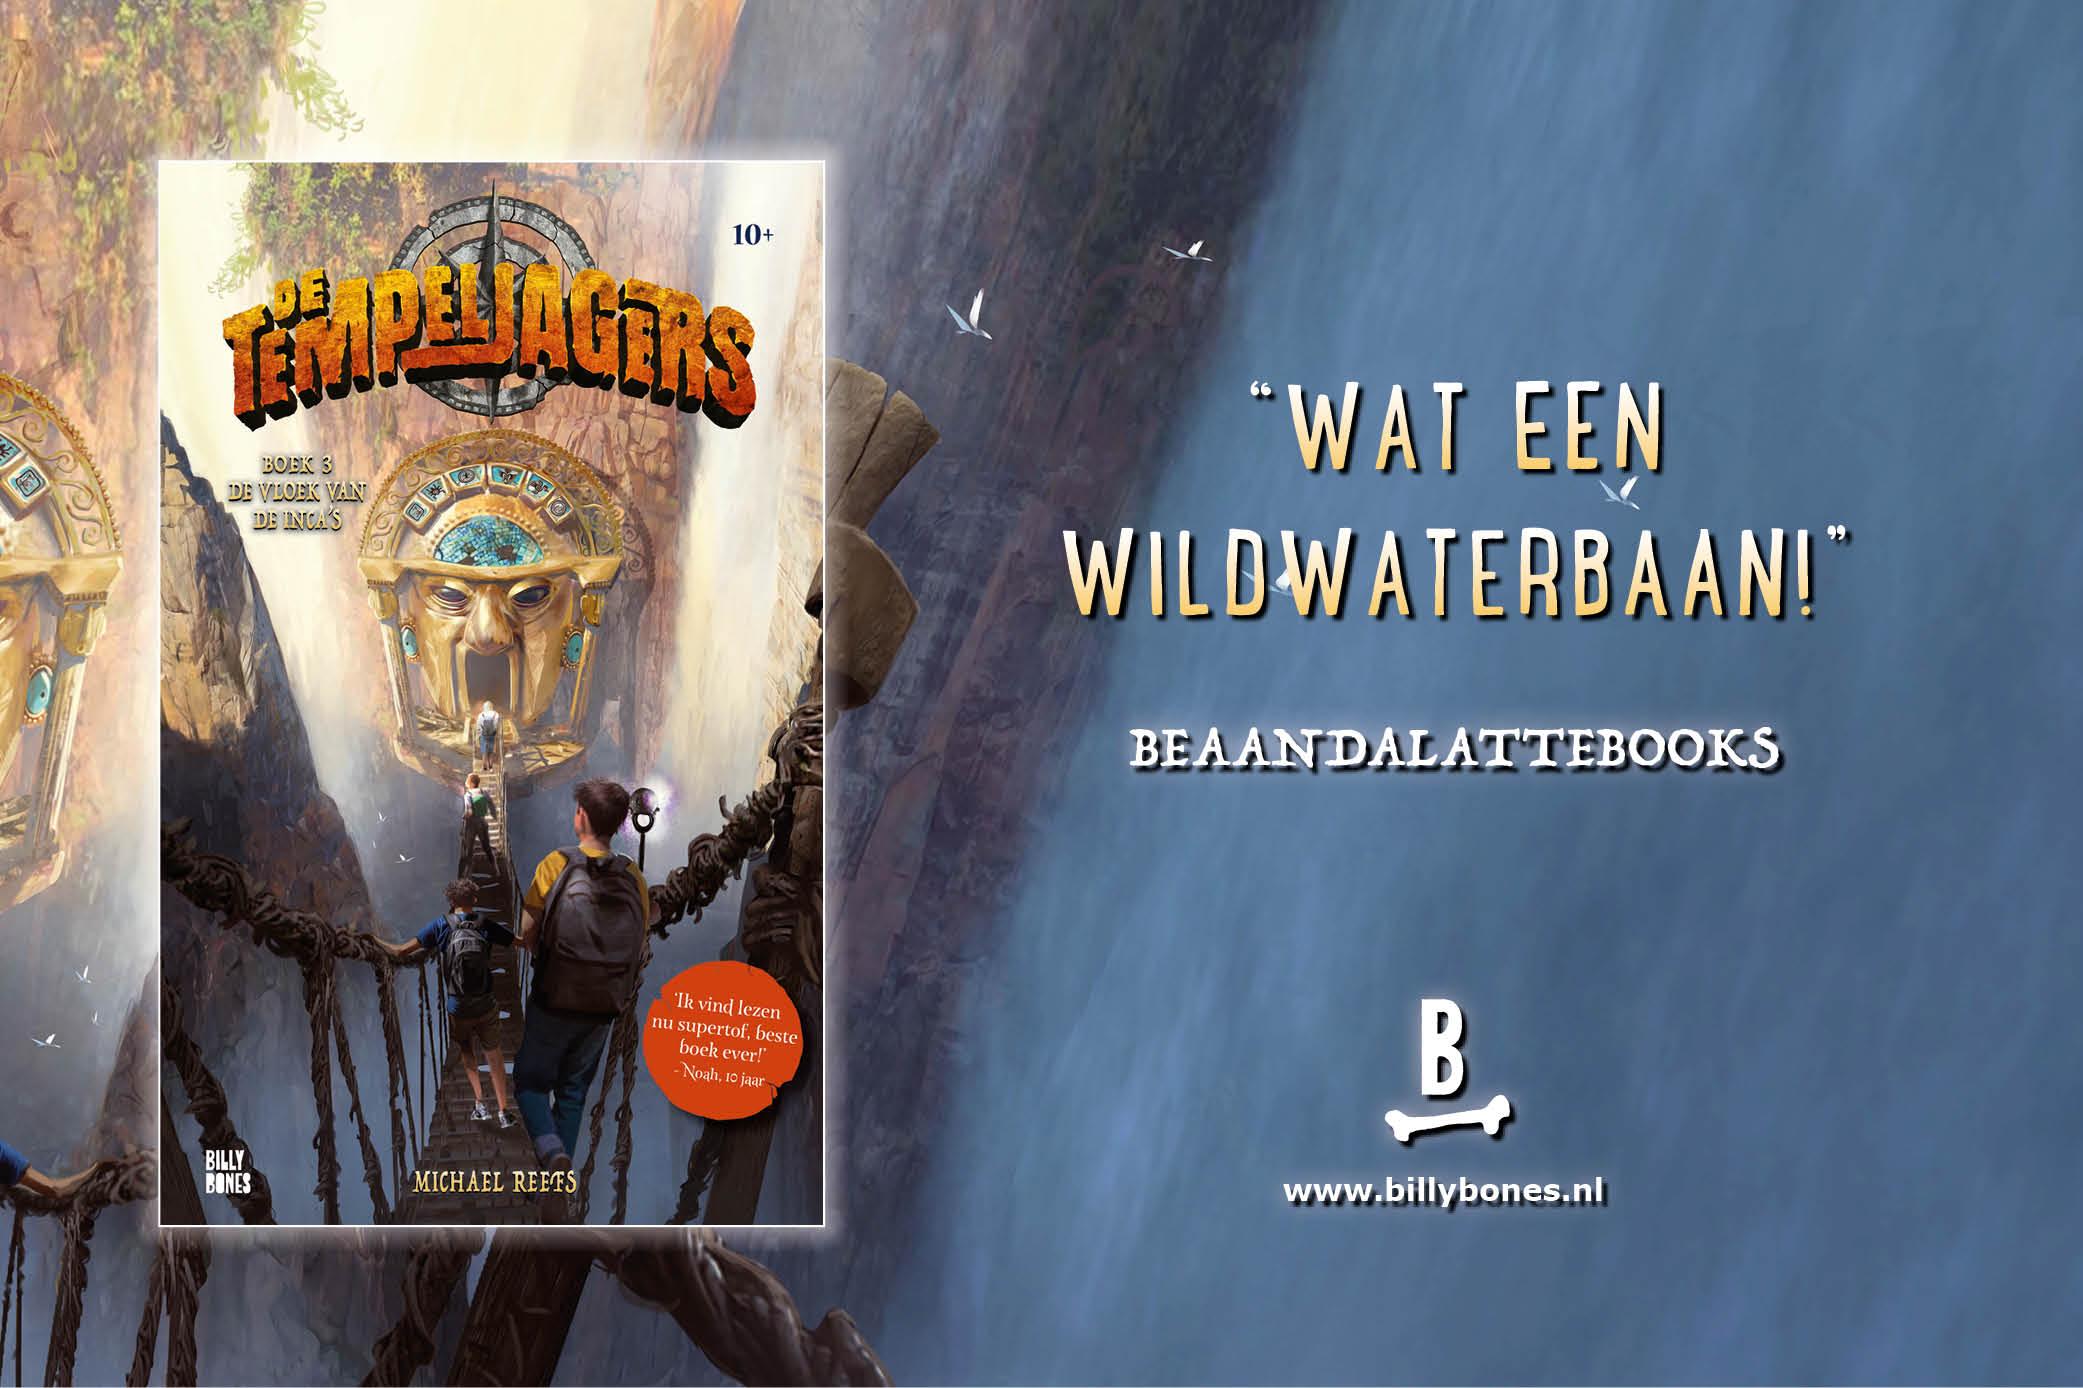 tempeljagers_quote_beaandalattebooks